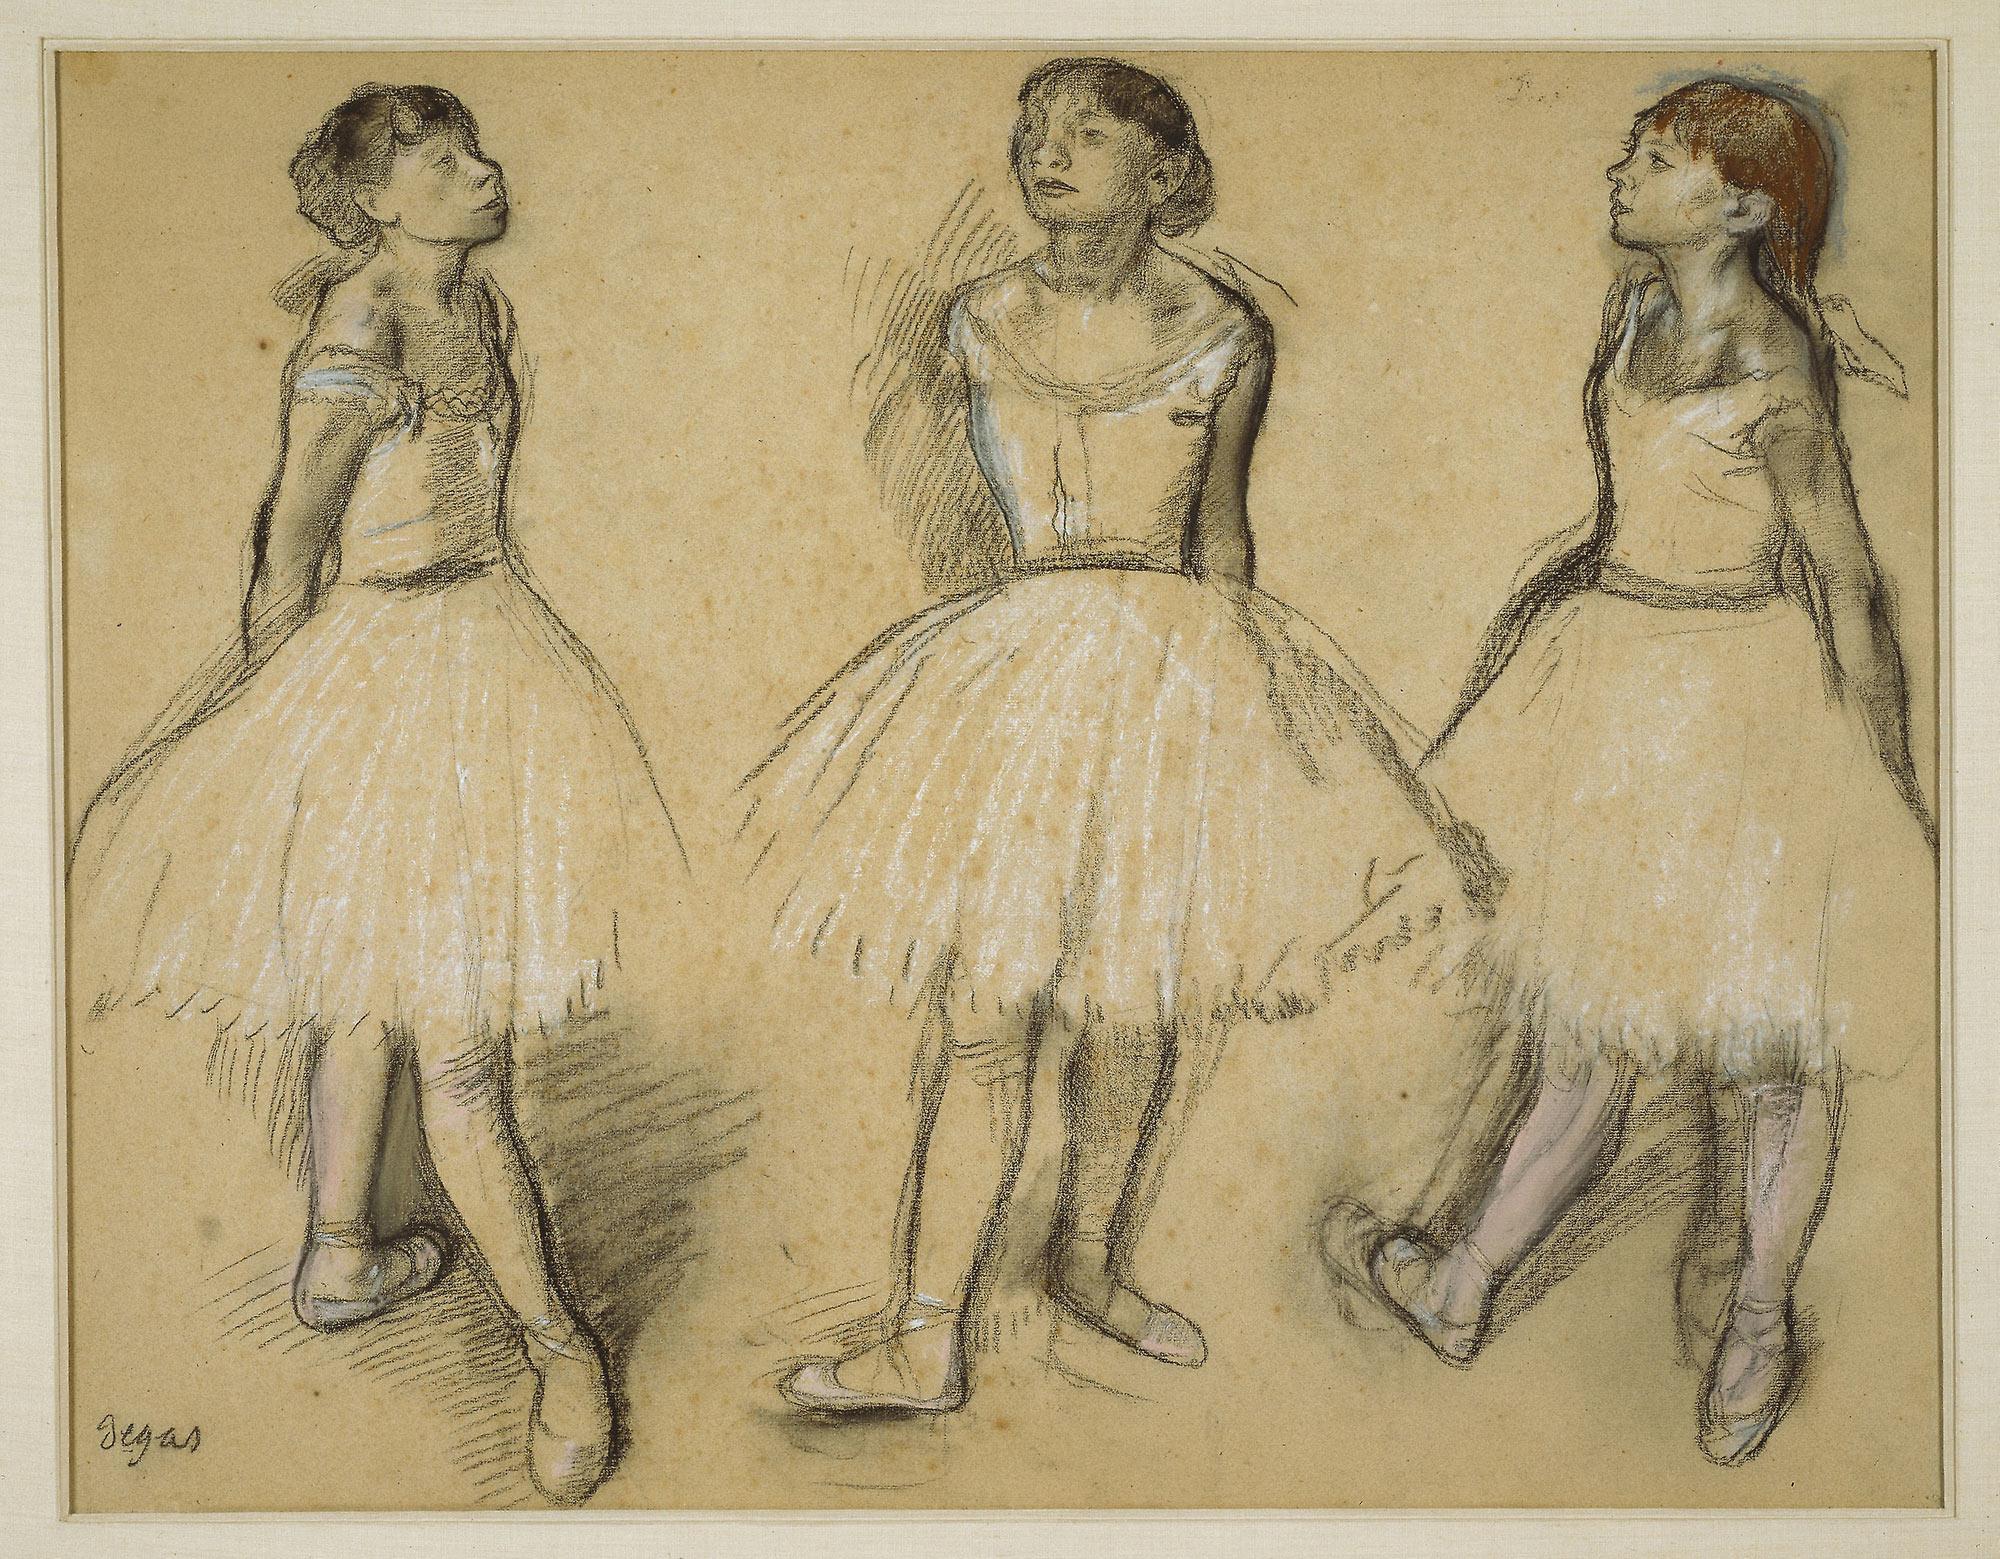 Edgar Degas, Tre studi di una ballerina in quarta posizione (1879-80; carboncino e pastello su carta, 48 x 61,6 cm; Chicago, Art Institute)